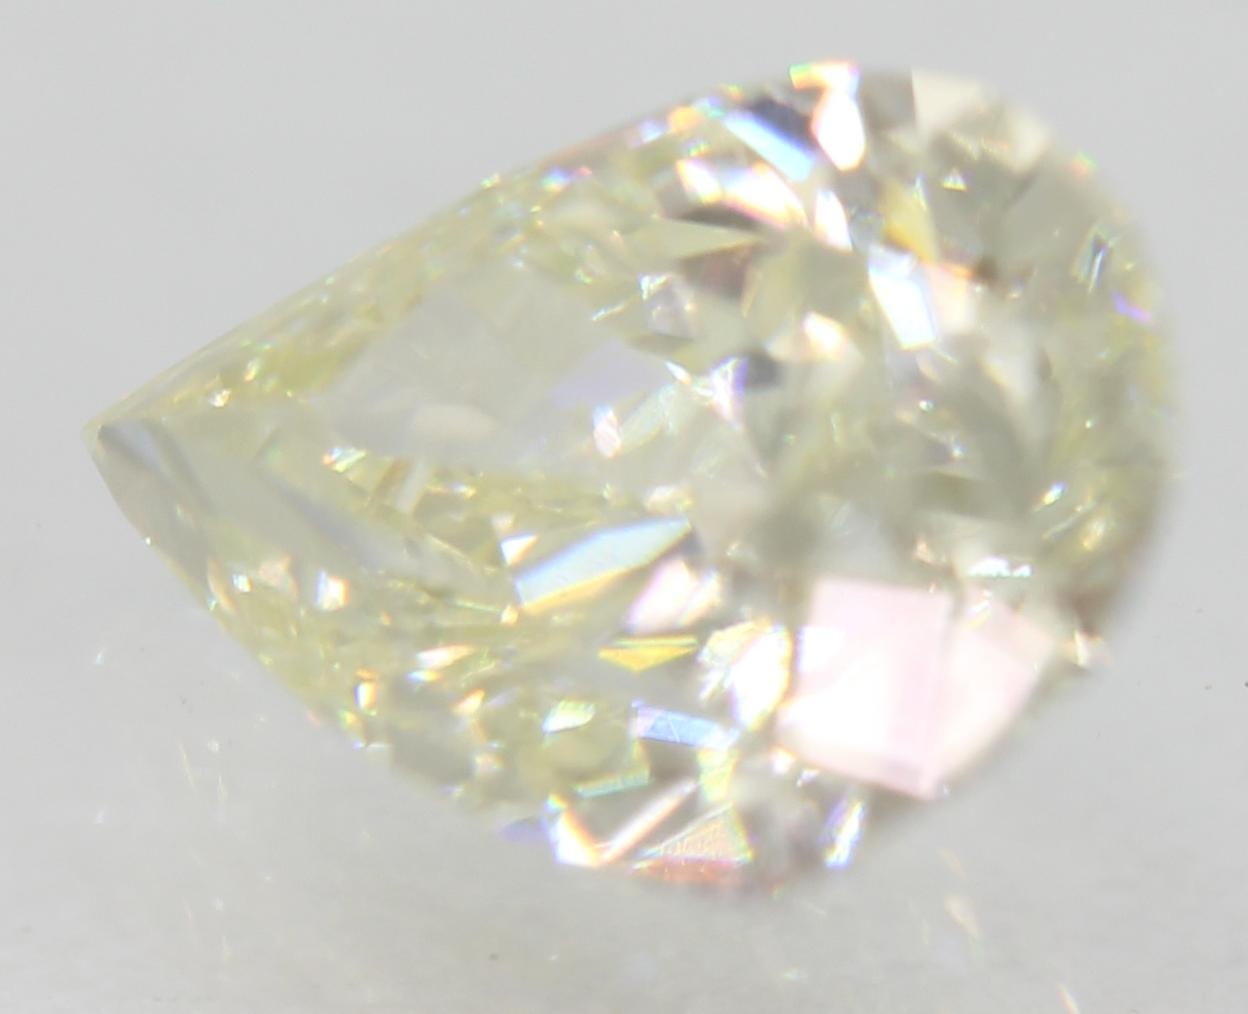 Certified 1.01 Carat J VVS1 Pear Enhanced Natural Loose Diamond 7.91x5.49mm